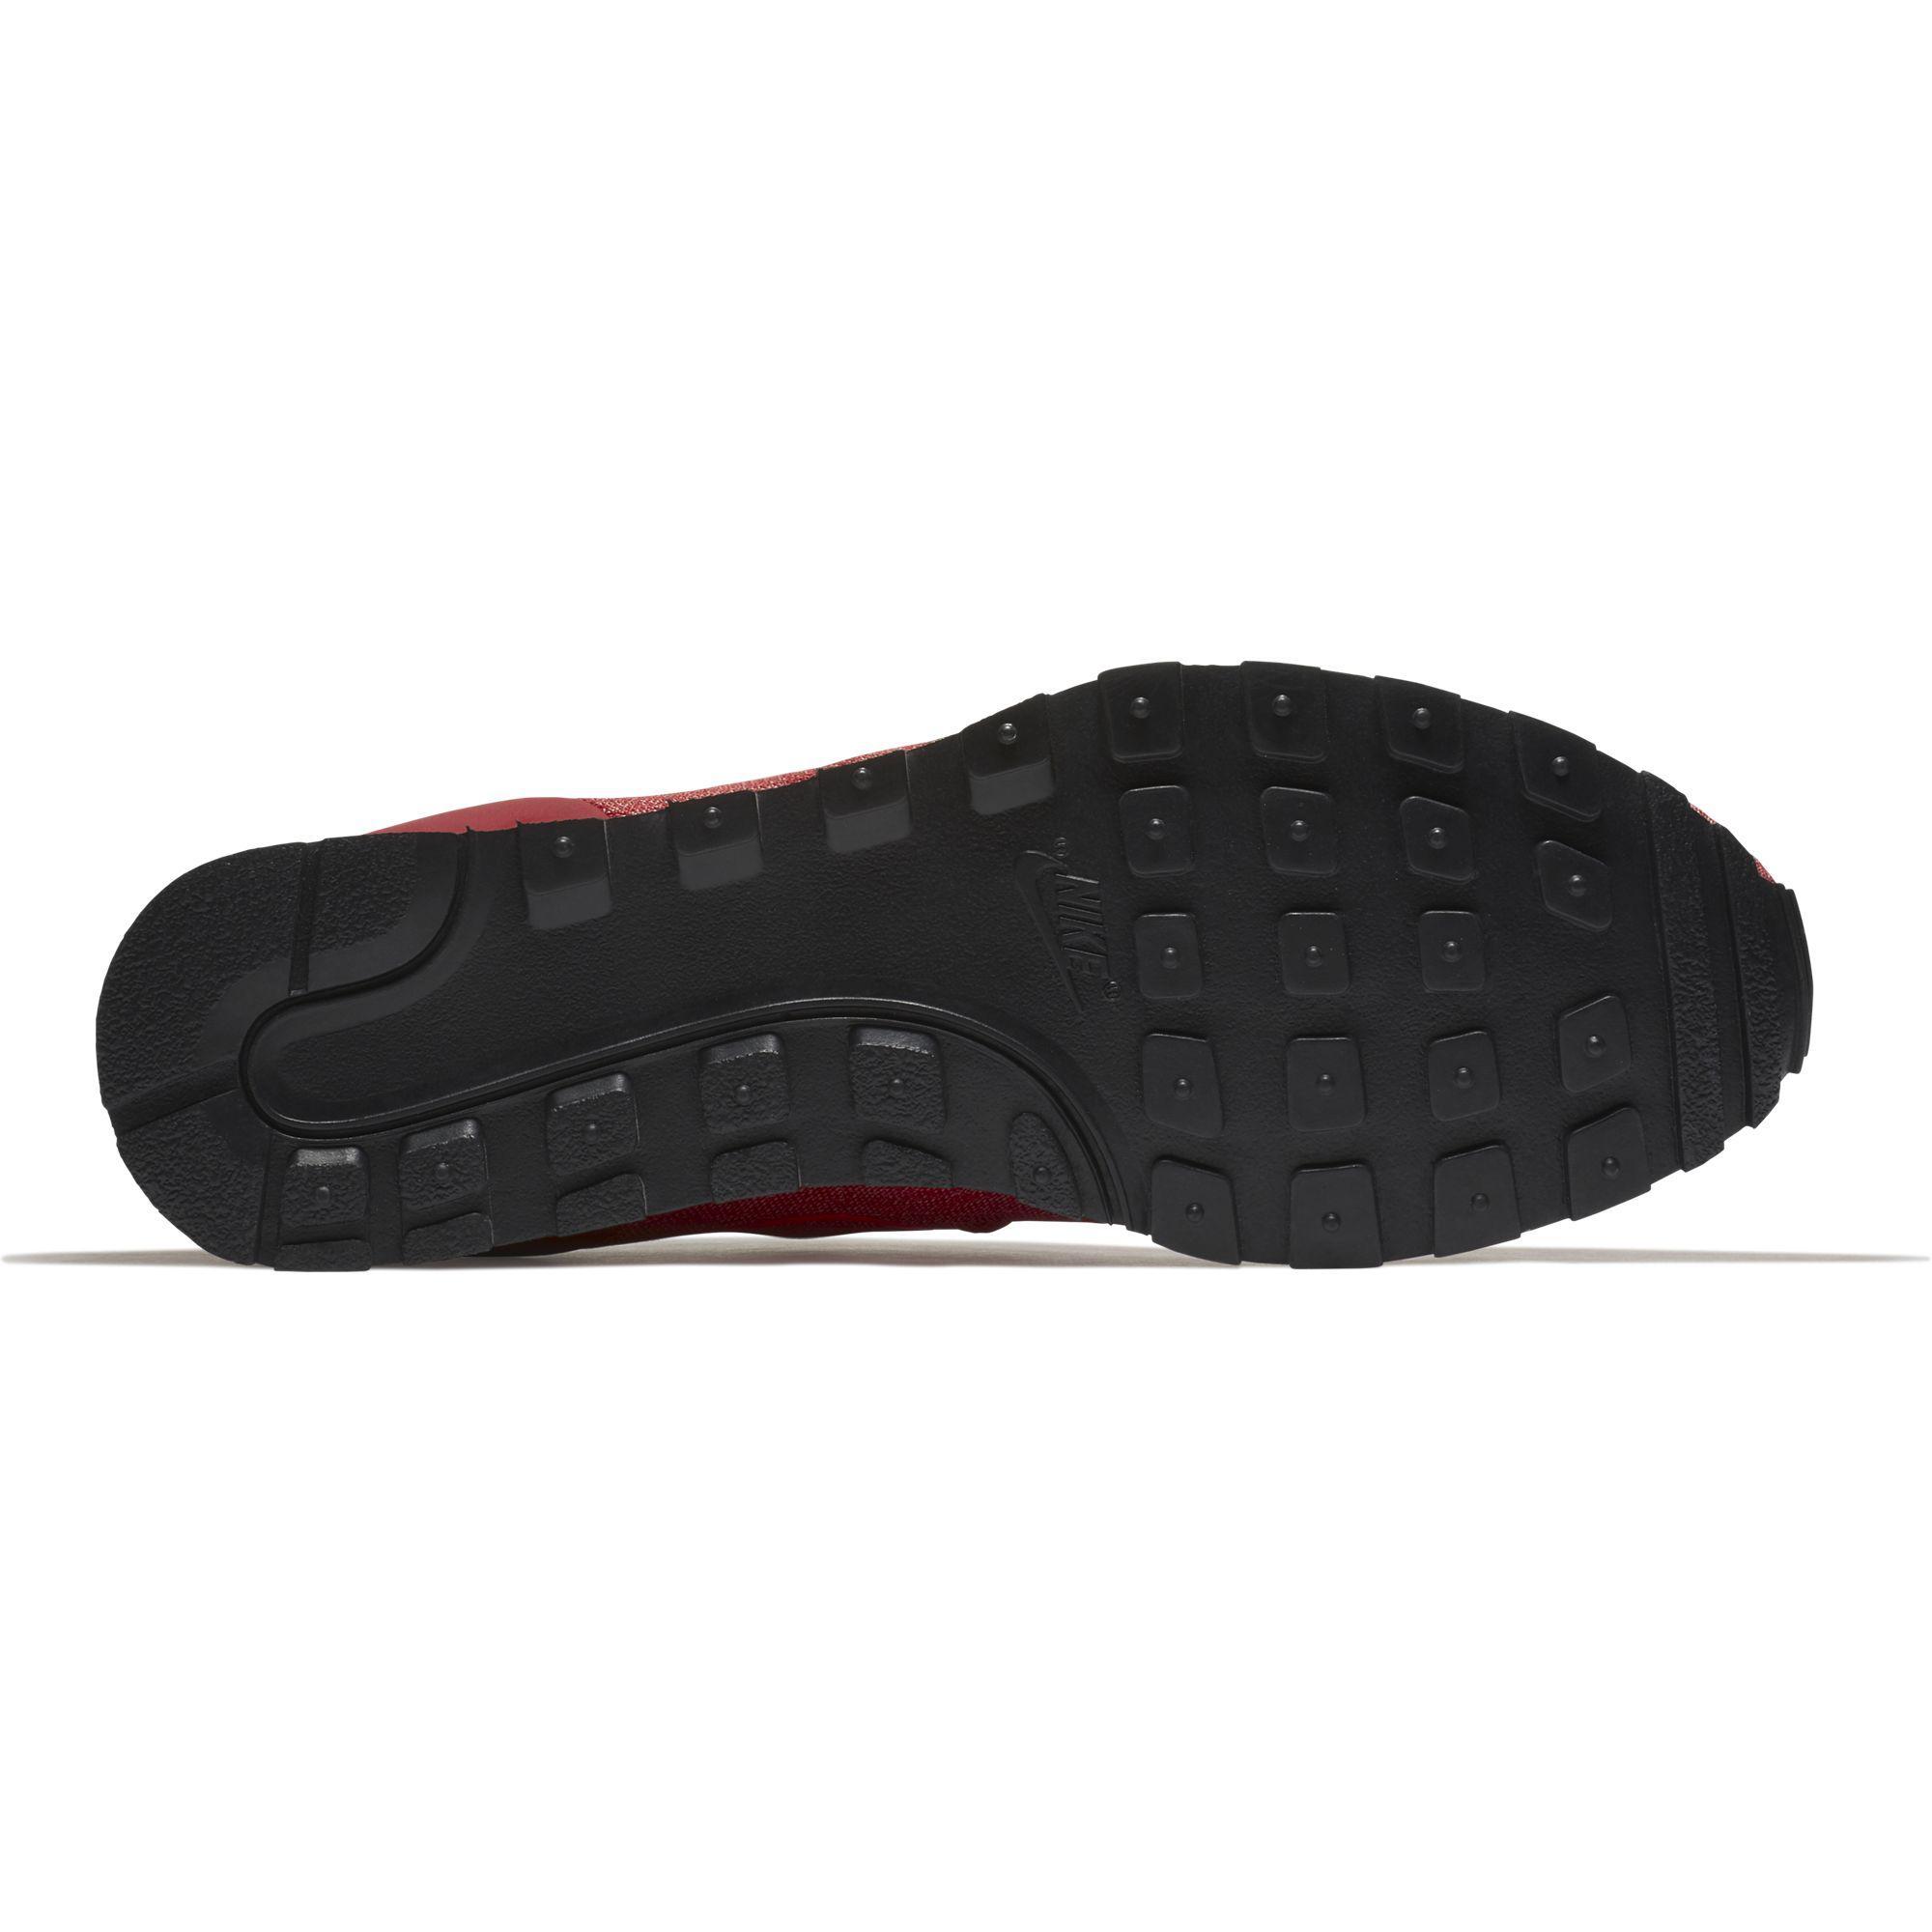 los angeles fee5d 63d2c Nike Mens MD Runner 2 ENG Mesh Running Shoes - Gym Red - Tennisnuts.com